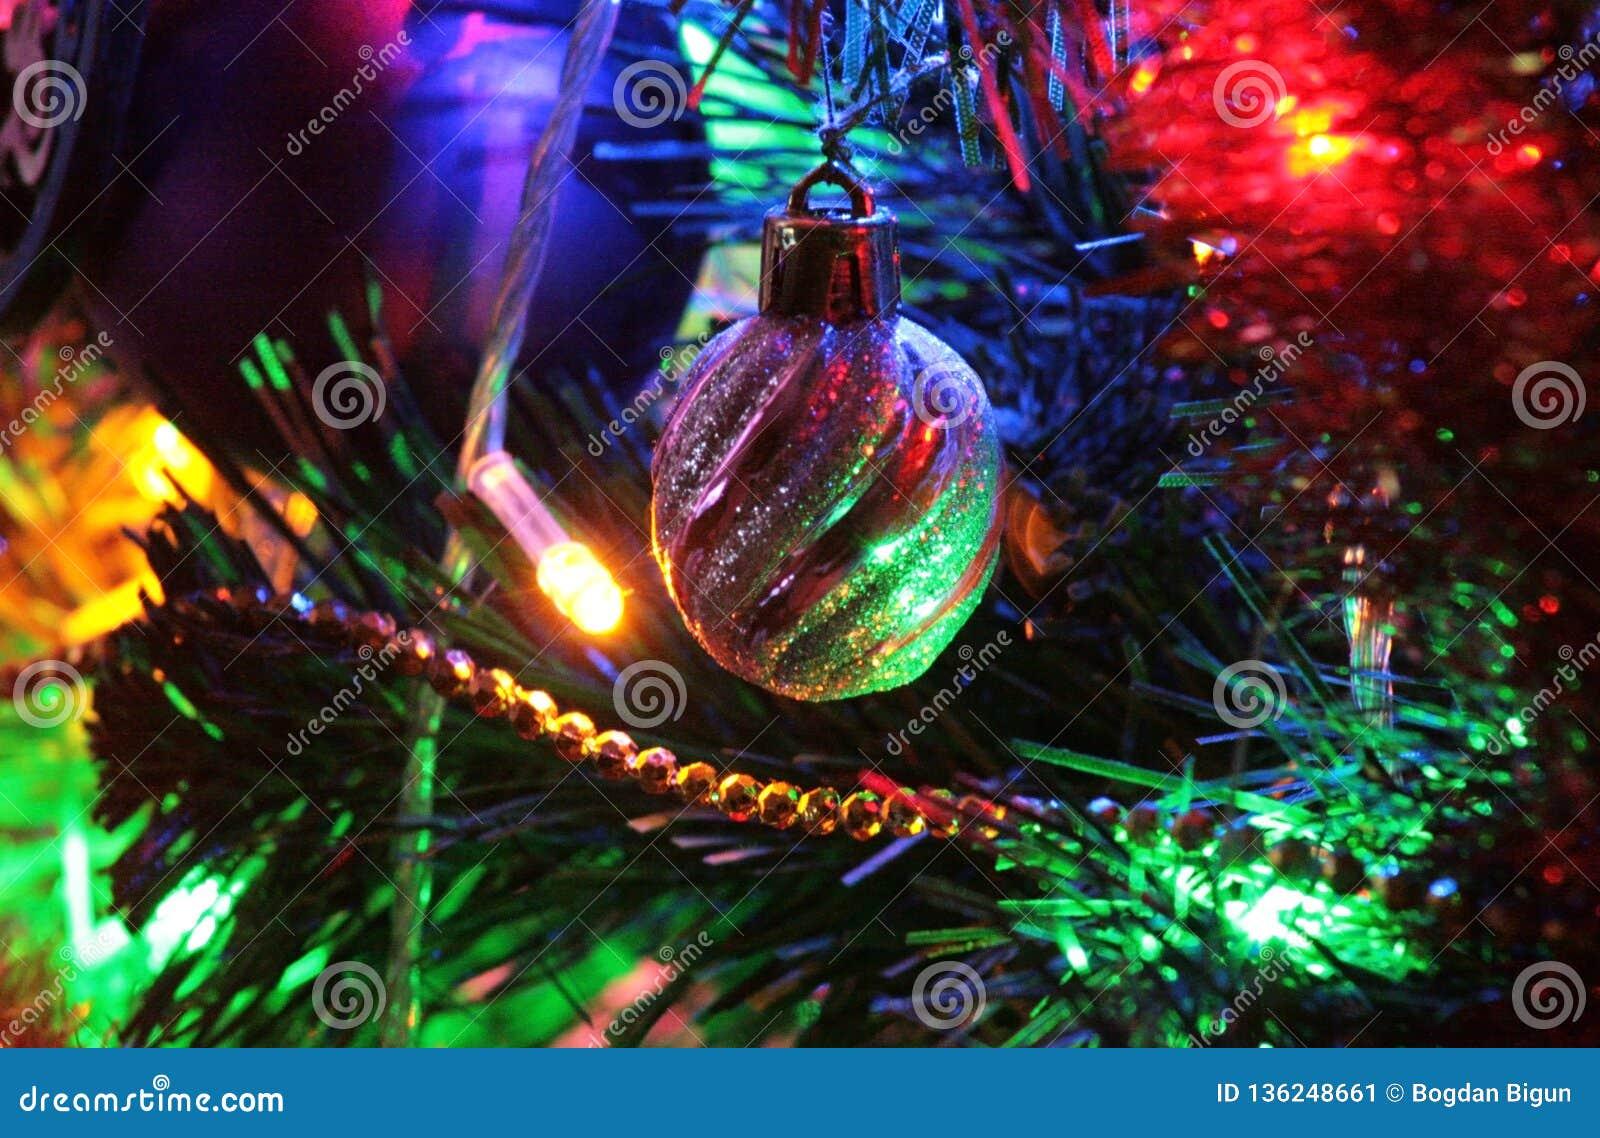 Bullet, Christmas decoration and beautiful illumination